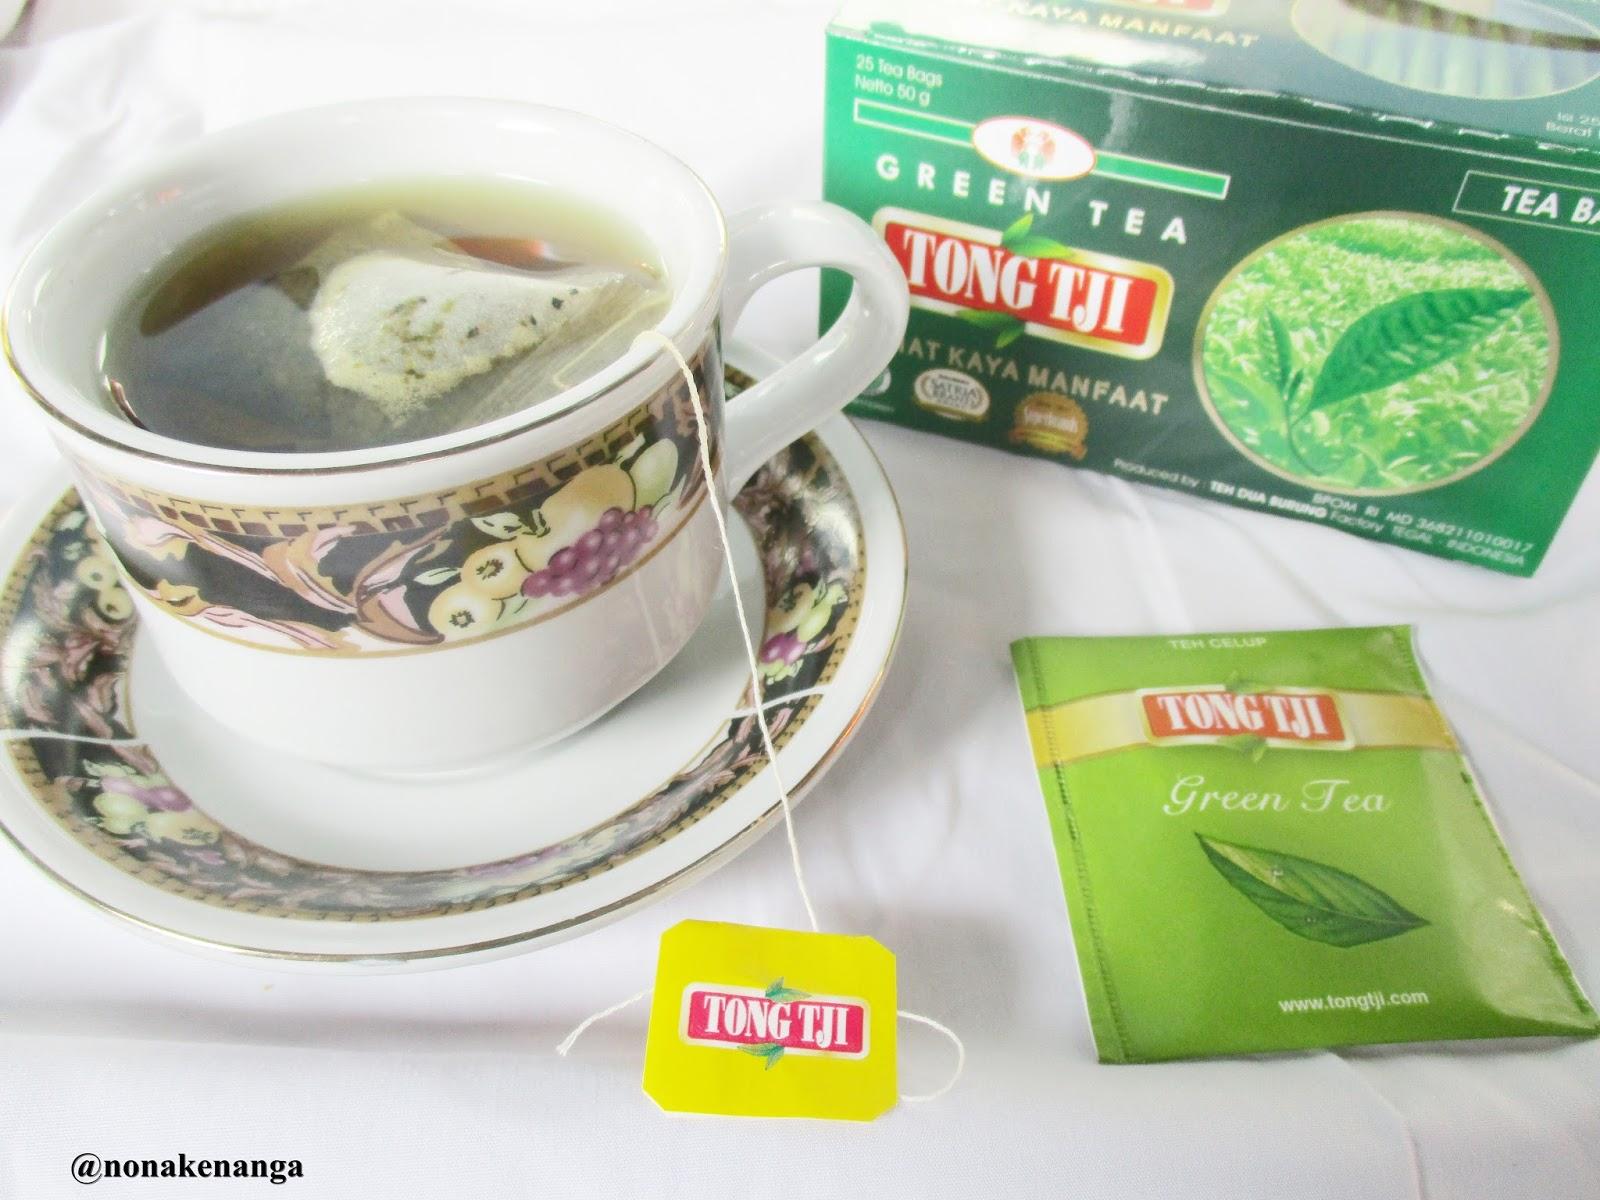 8 khasiat teh hijau untuk turunkan berat badan rahasia yang tak pernah tahu